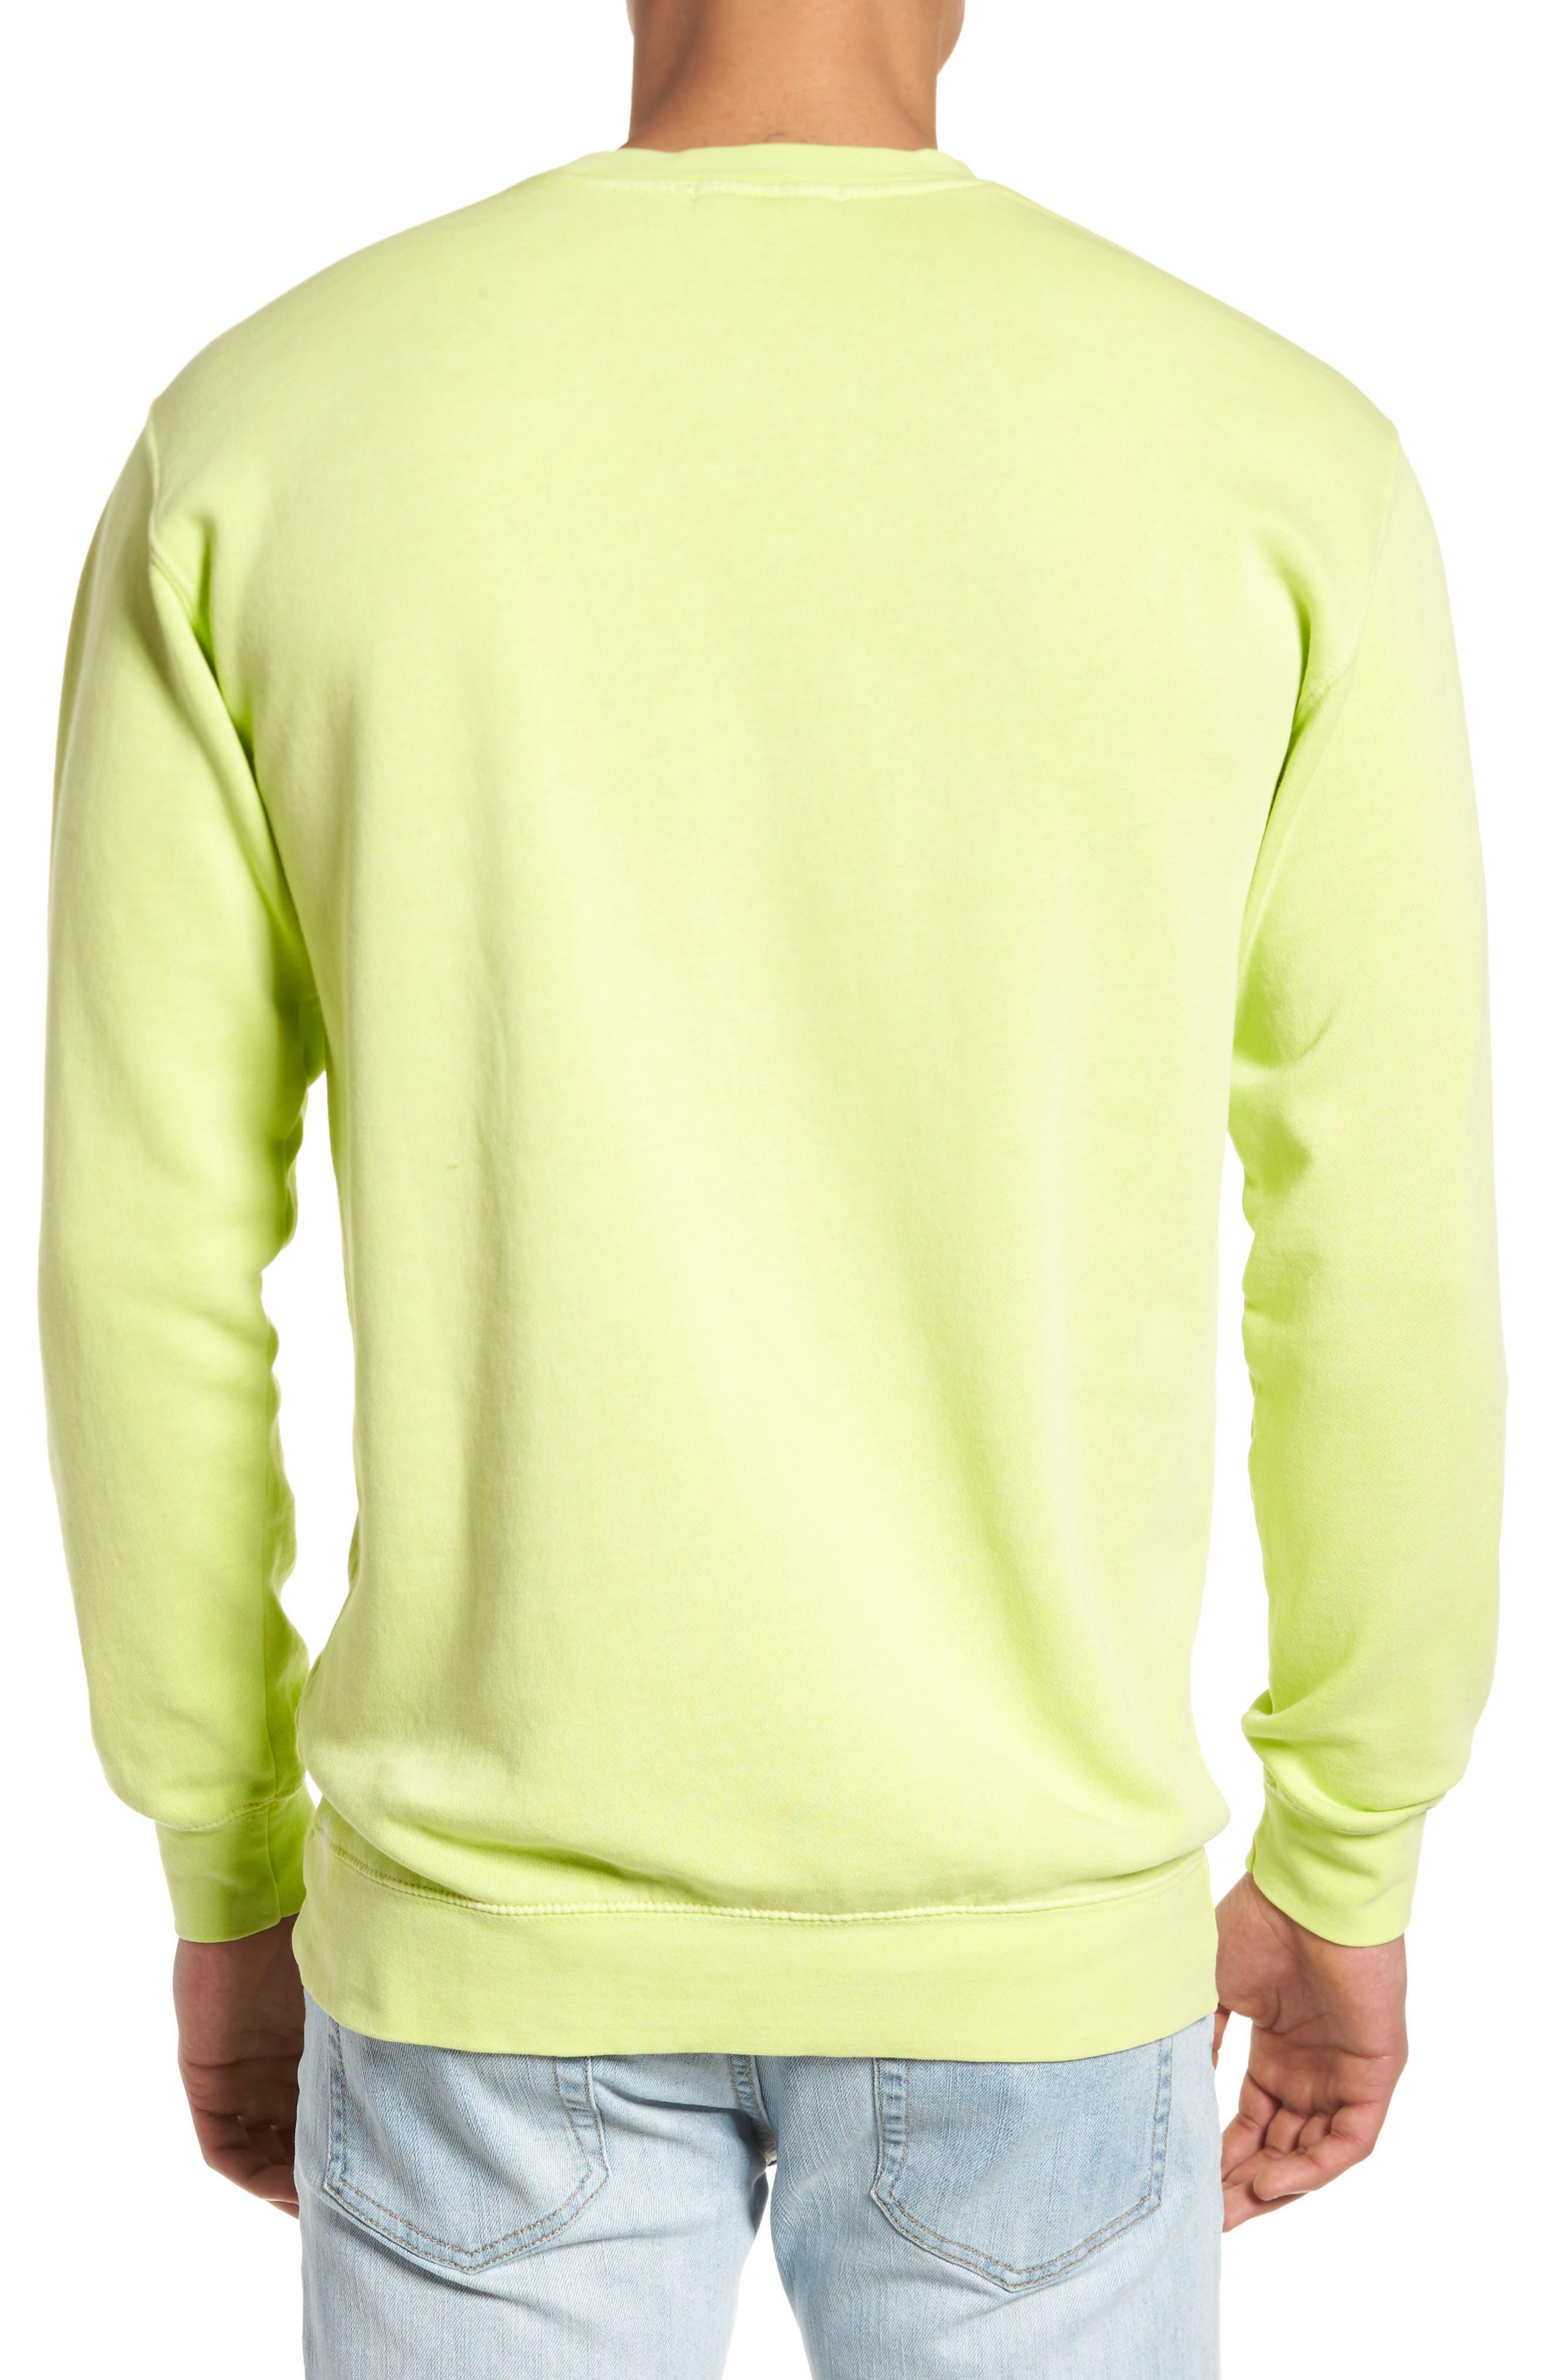 New World Sweatshirt,                             Alternate thumbnail 2, color,                             Dusty Mint